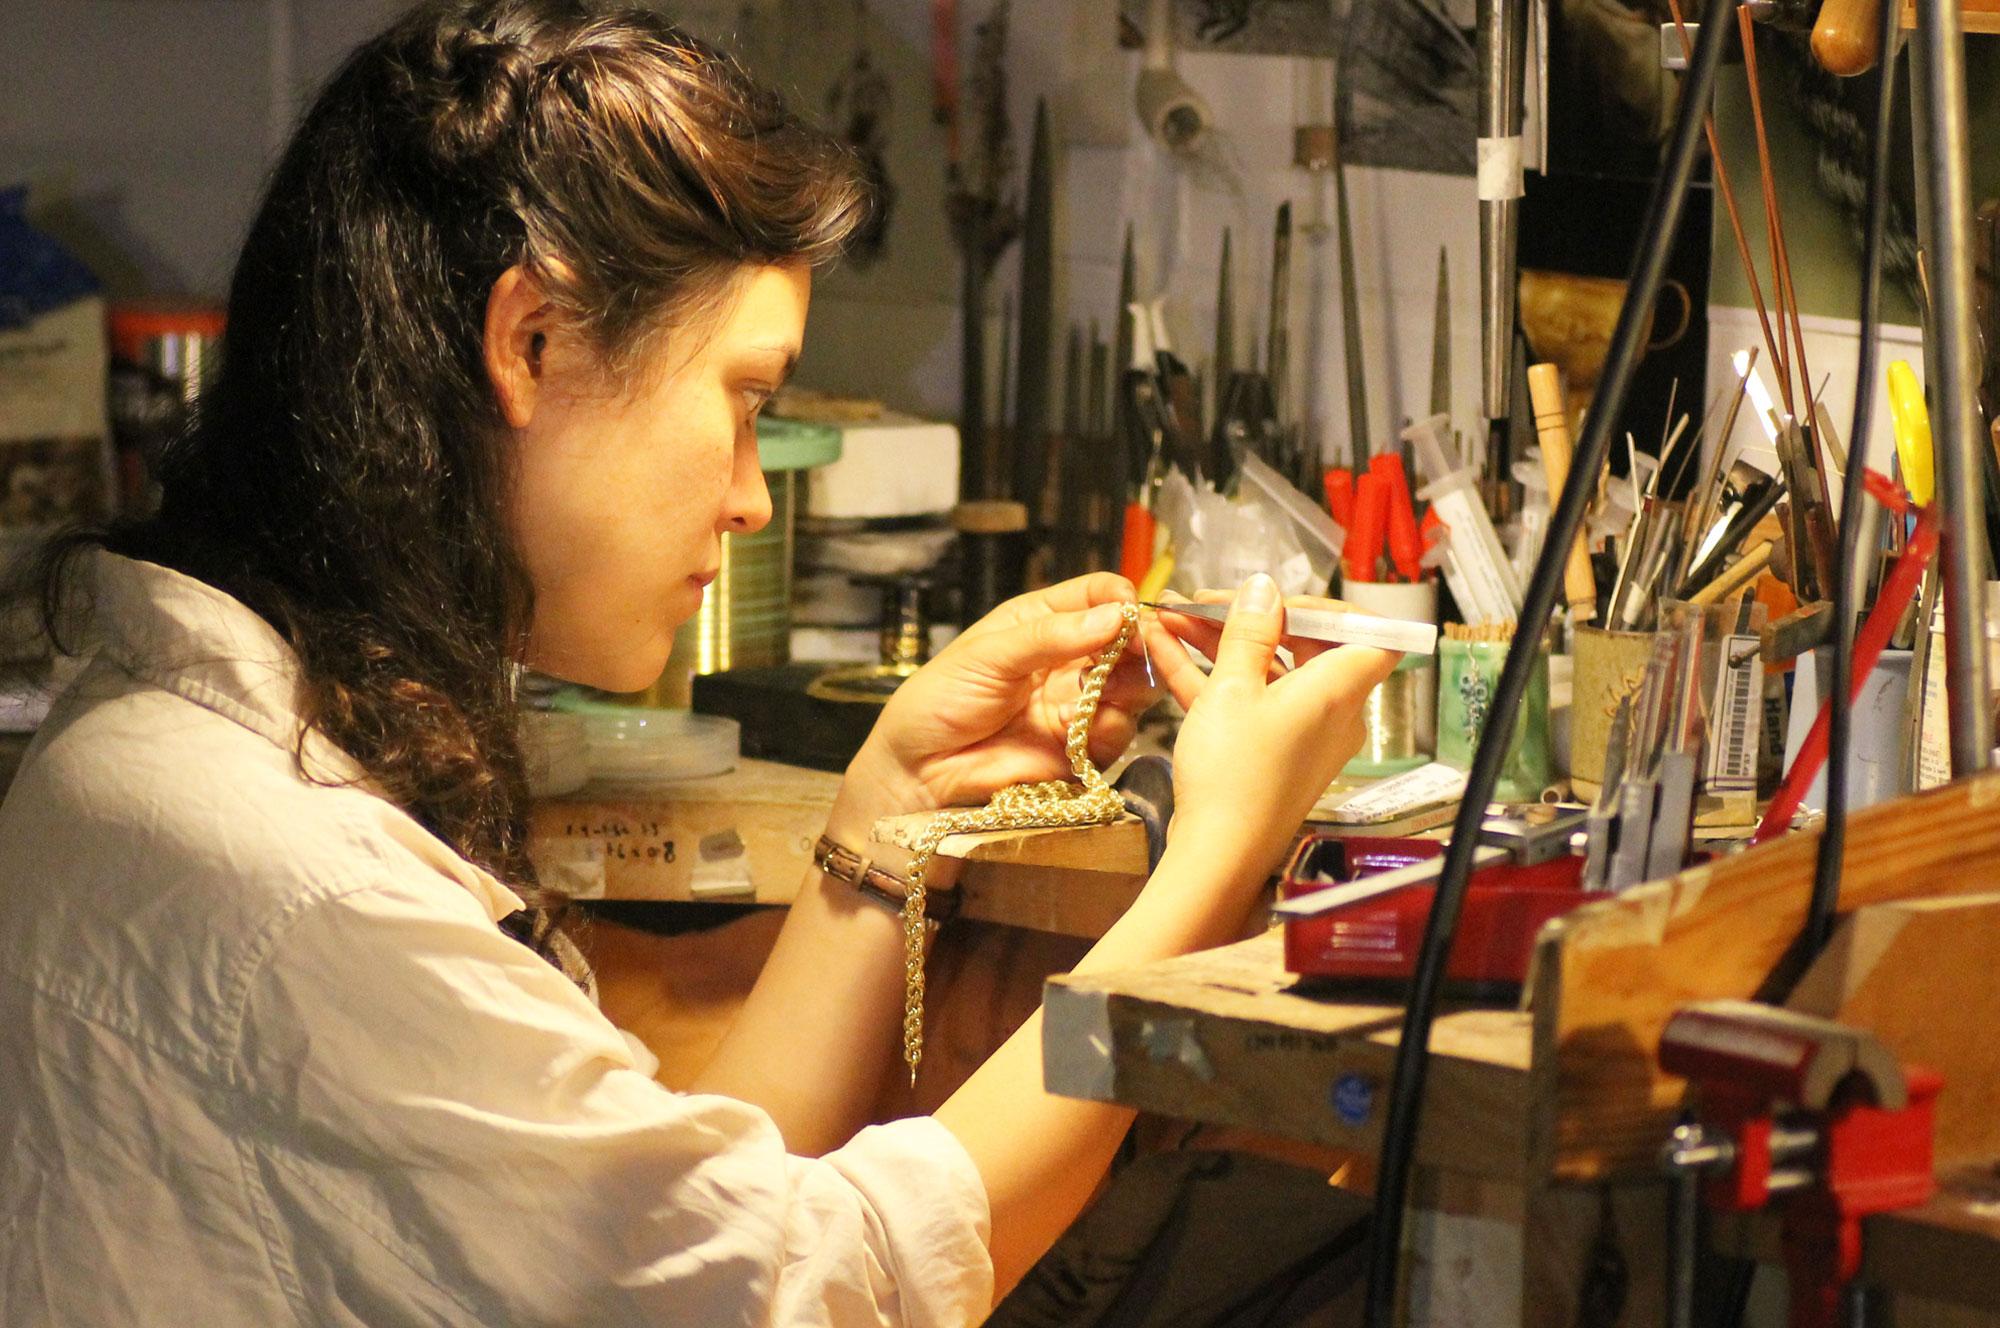 Lucie-Gledhill-making.jpg